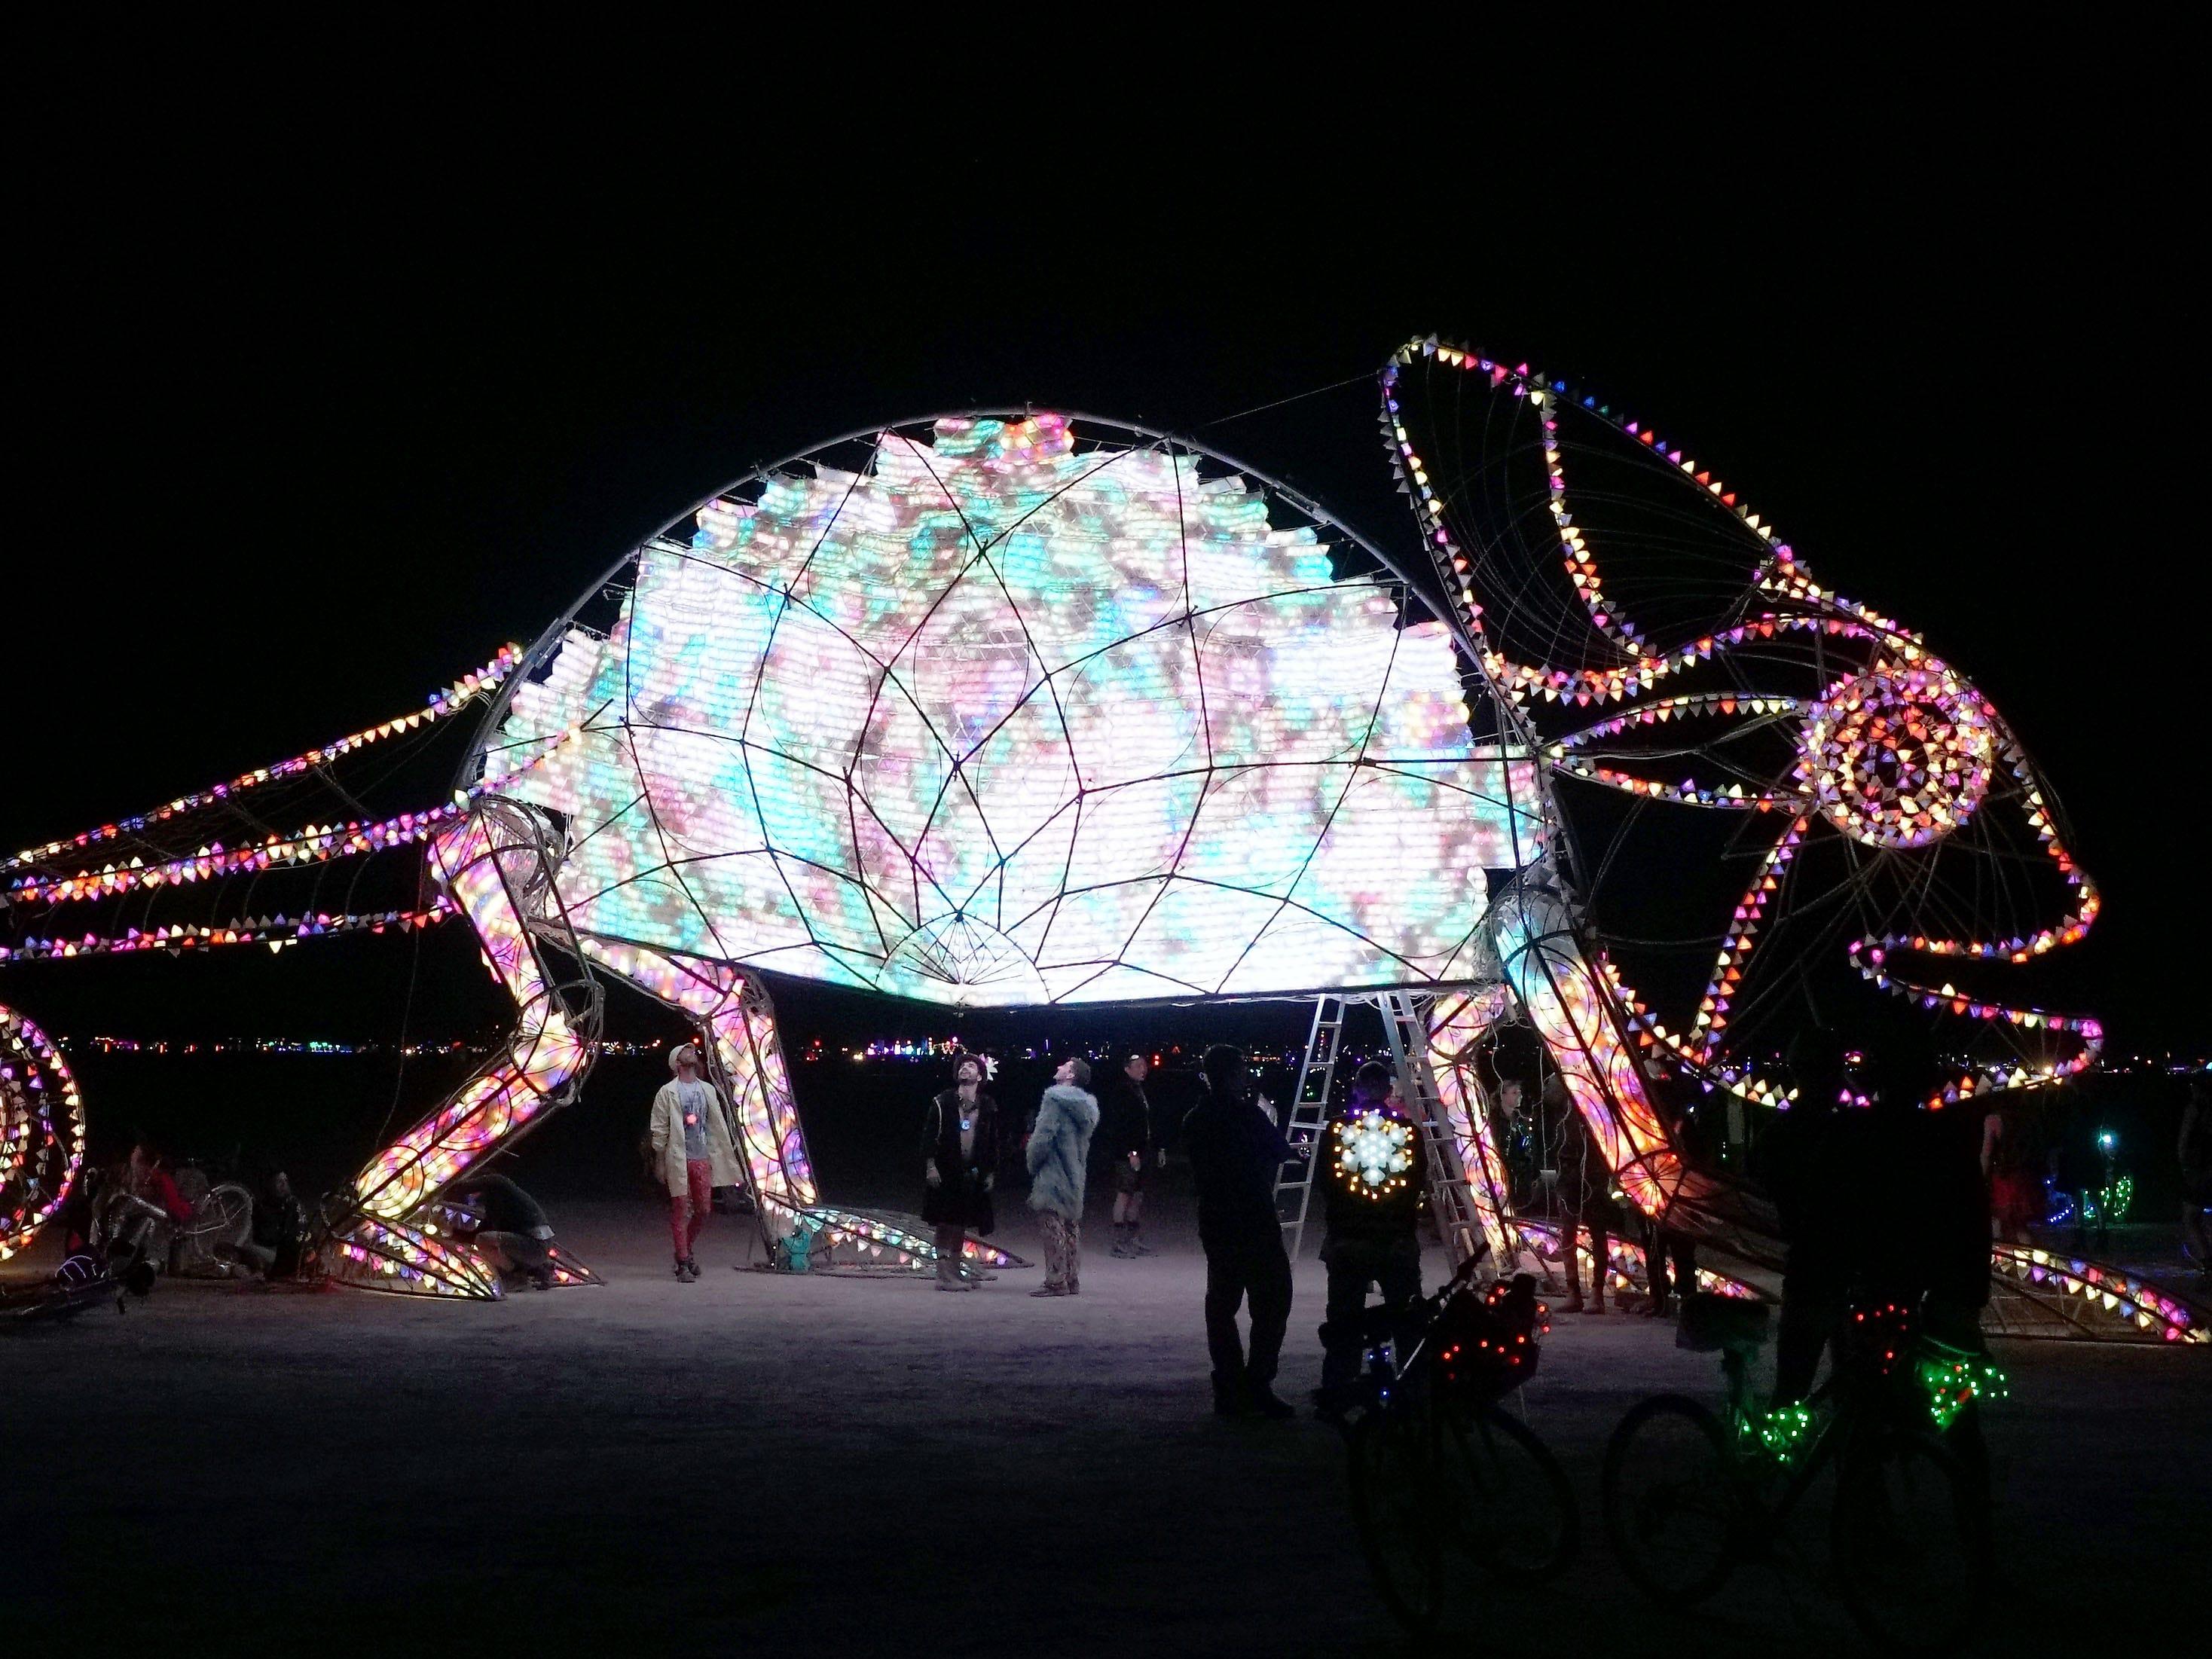 Burning Man attendees walk beneath an illuminated chameleon late at night.